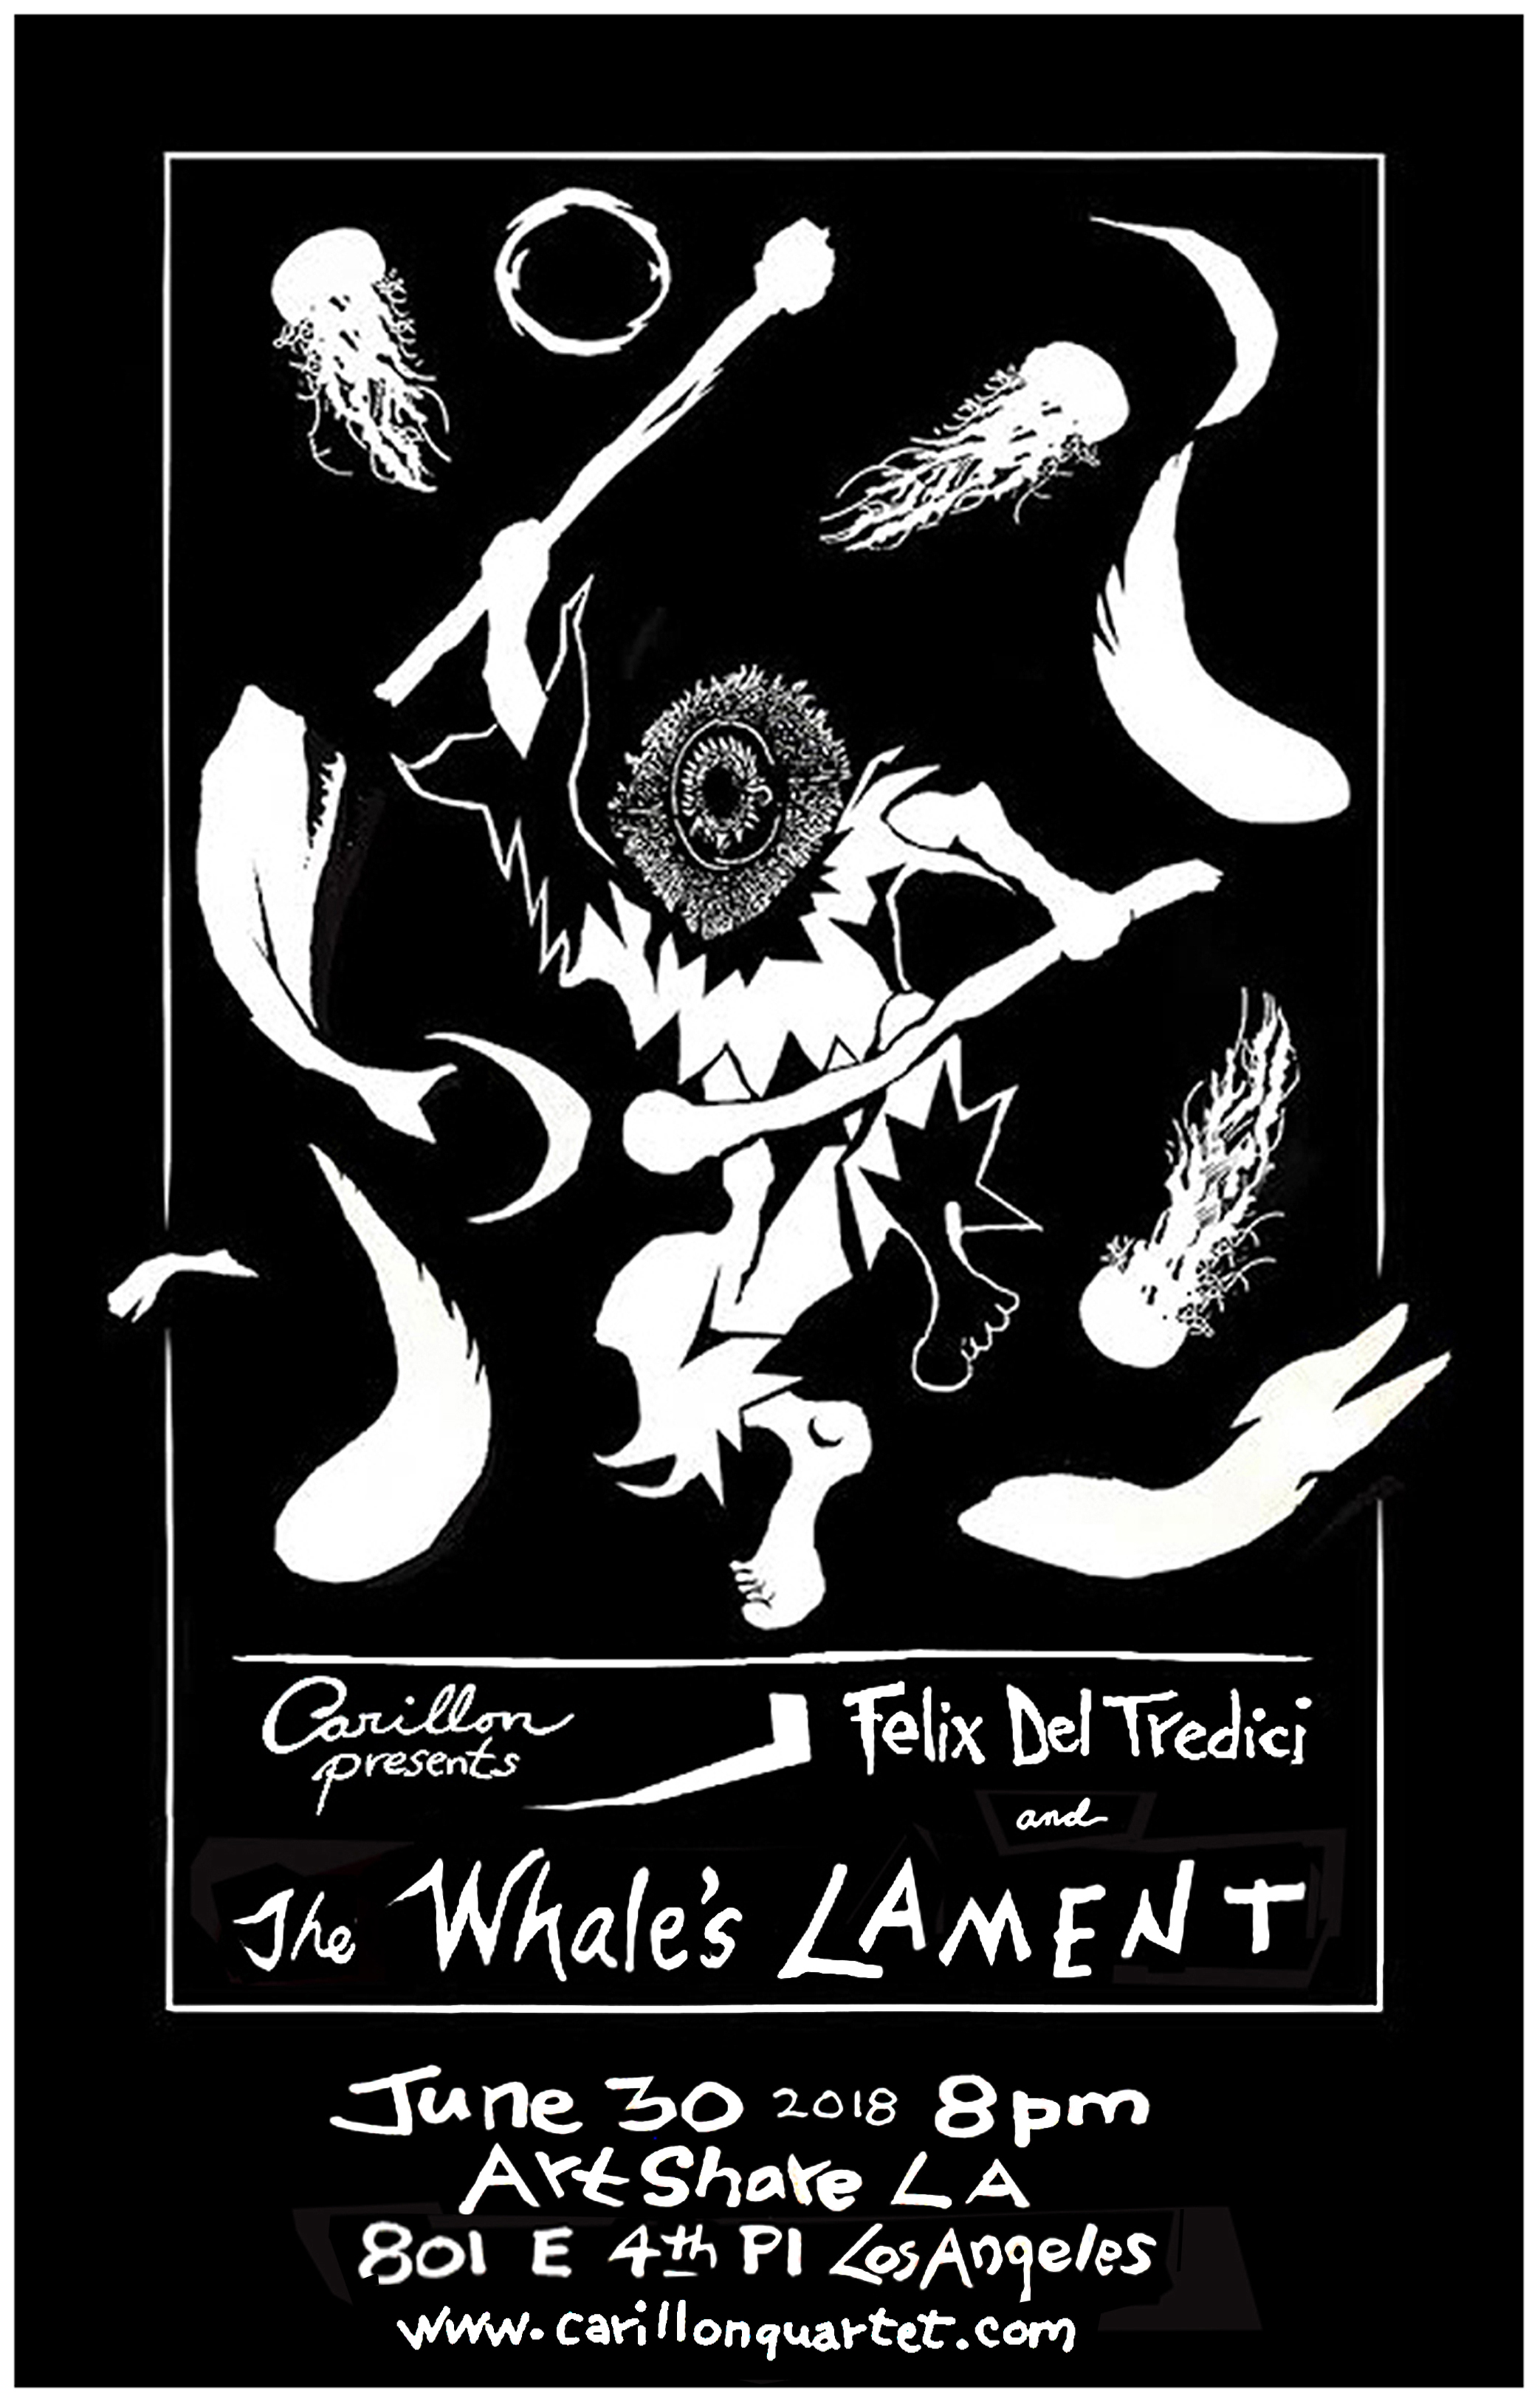 Carillon Presents: The Whale's Lament - Poster by: Robert Del Tredici